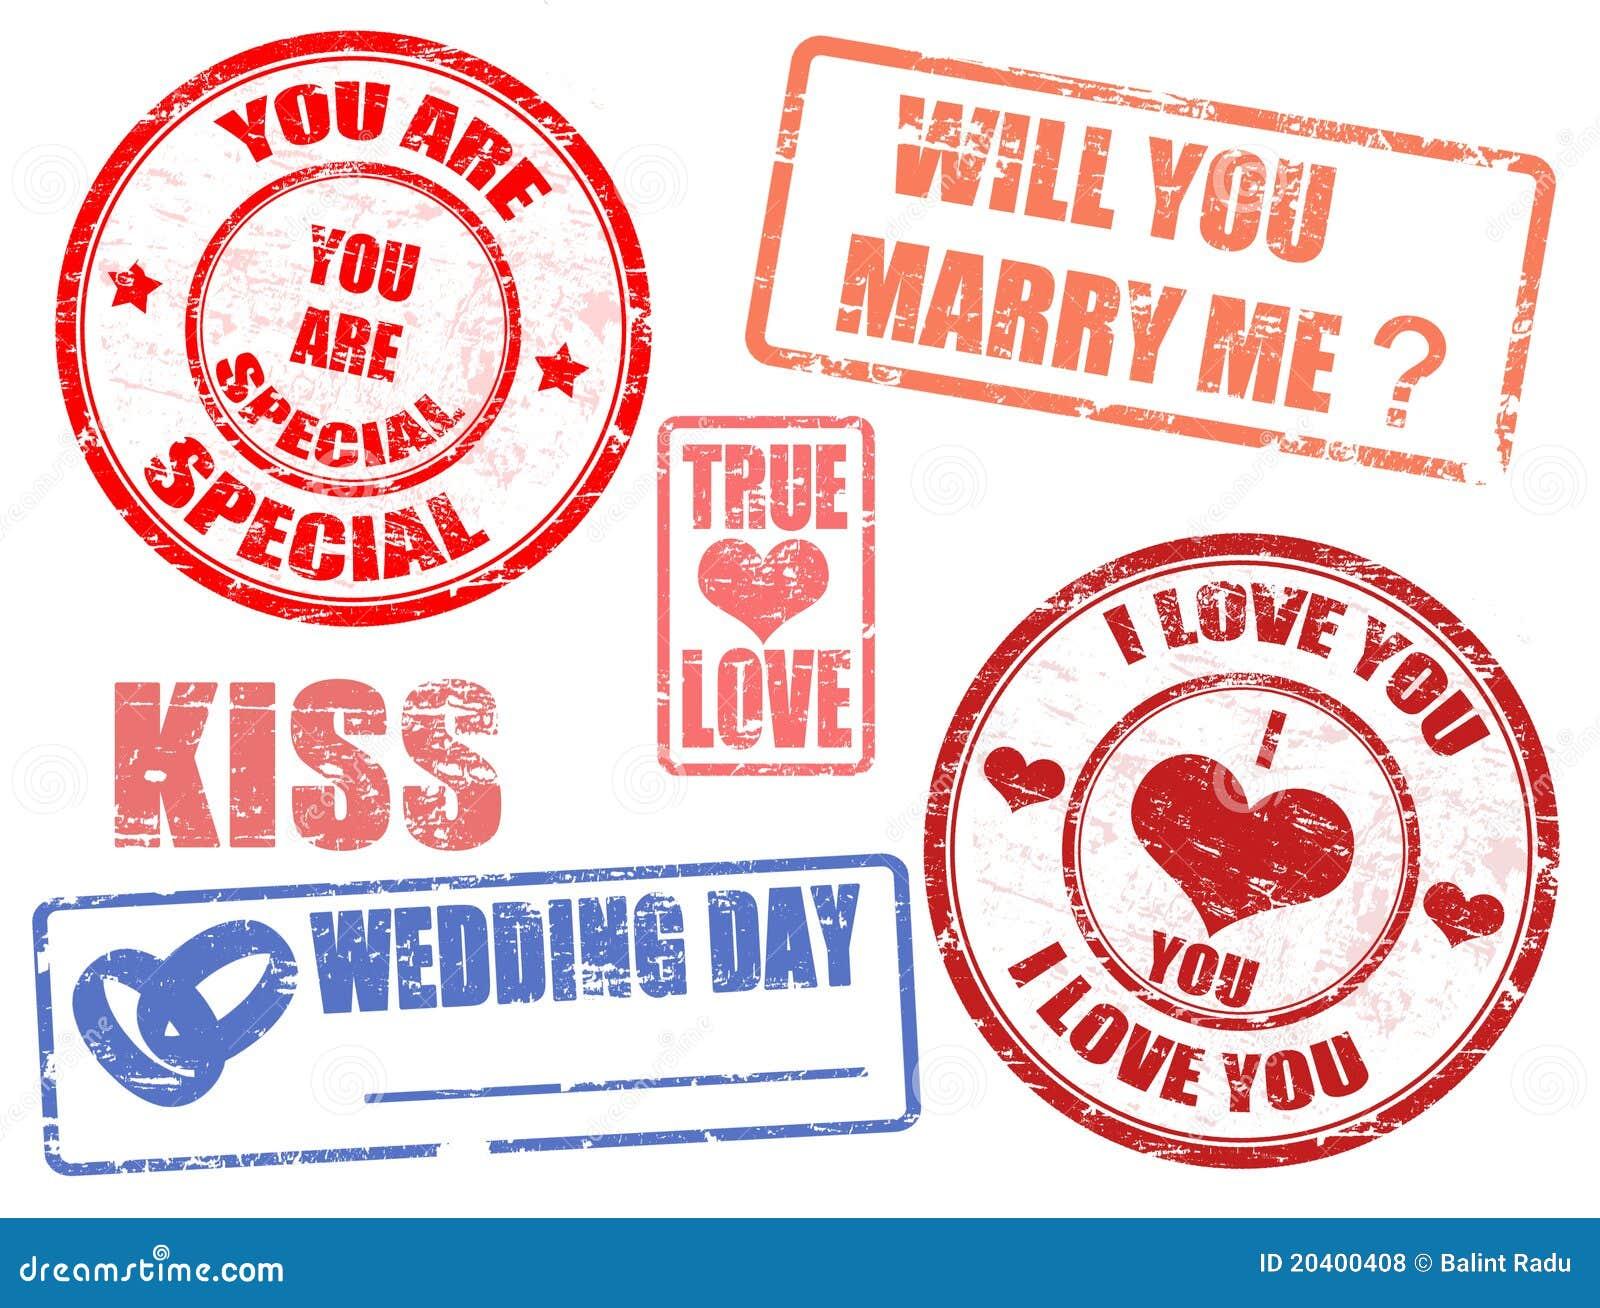 Wedding stamps stock vector. Illustration of elegance - 20400408